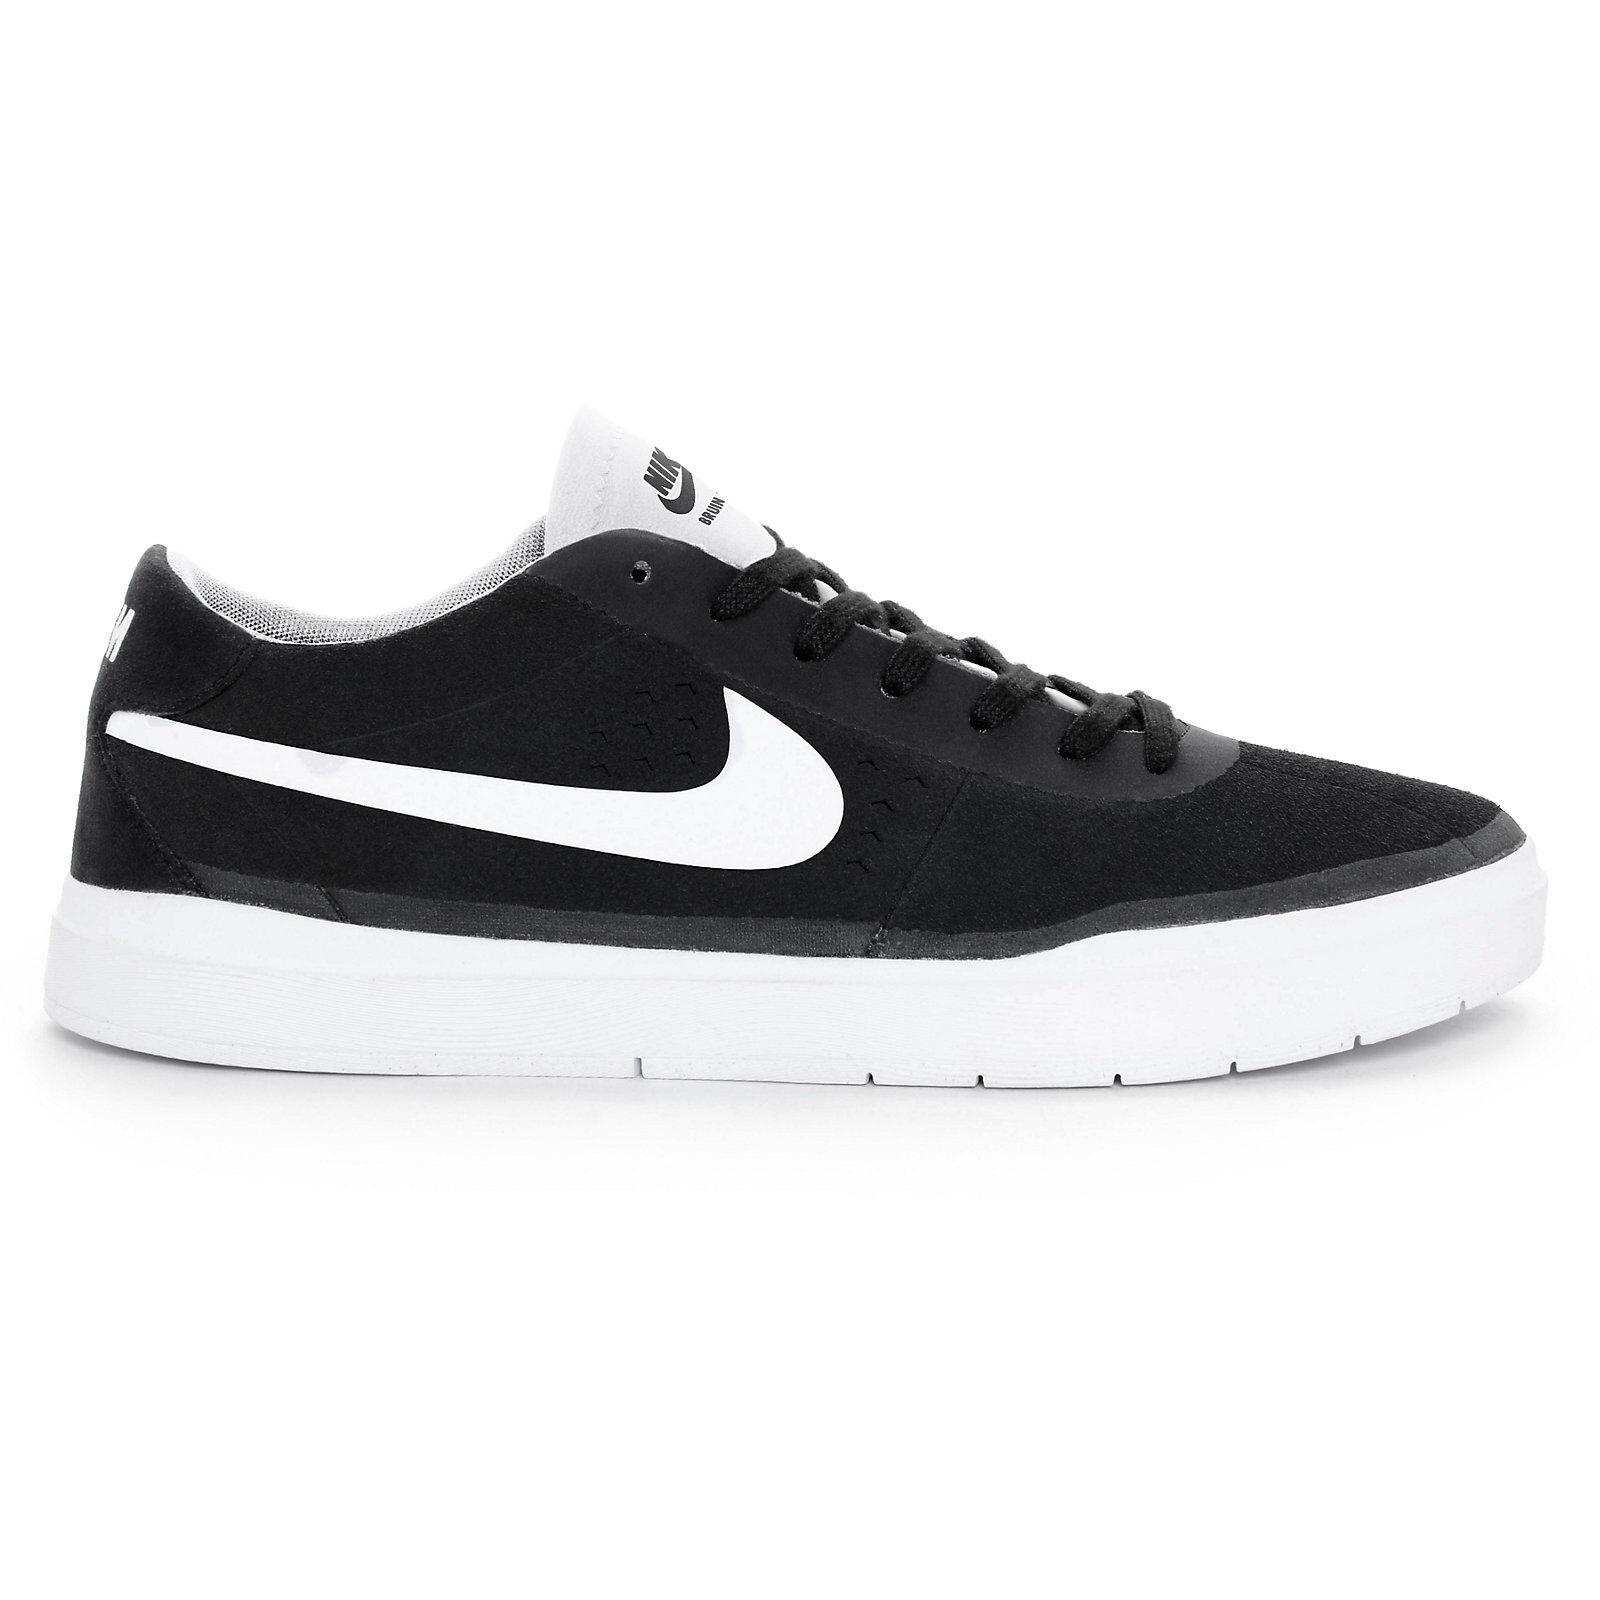 Nike - sb hyperfeel schwarz - weiß - - - \ Weiß skate